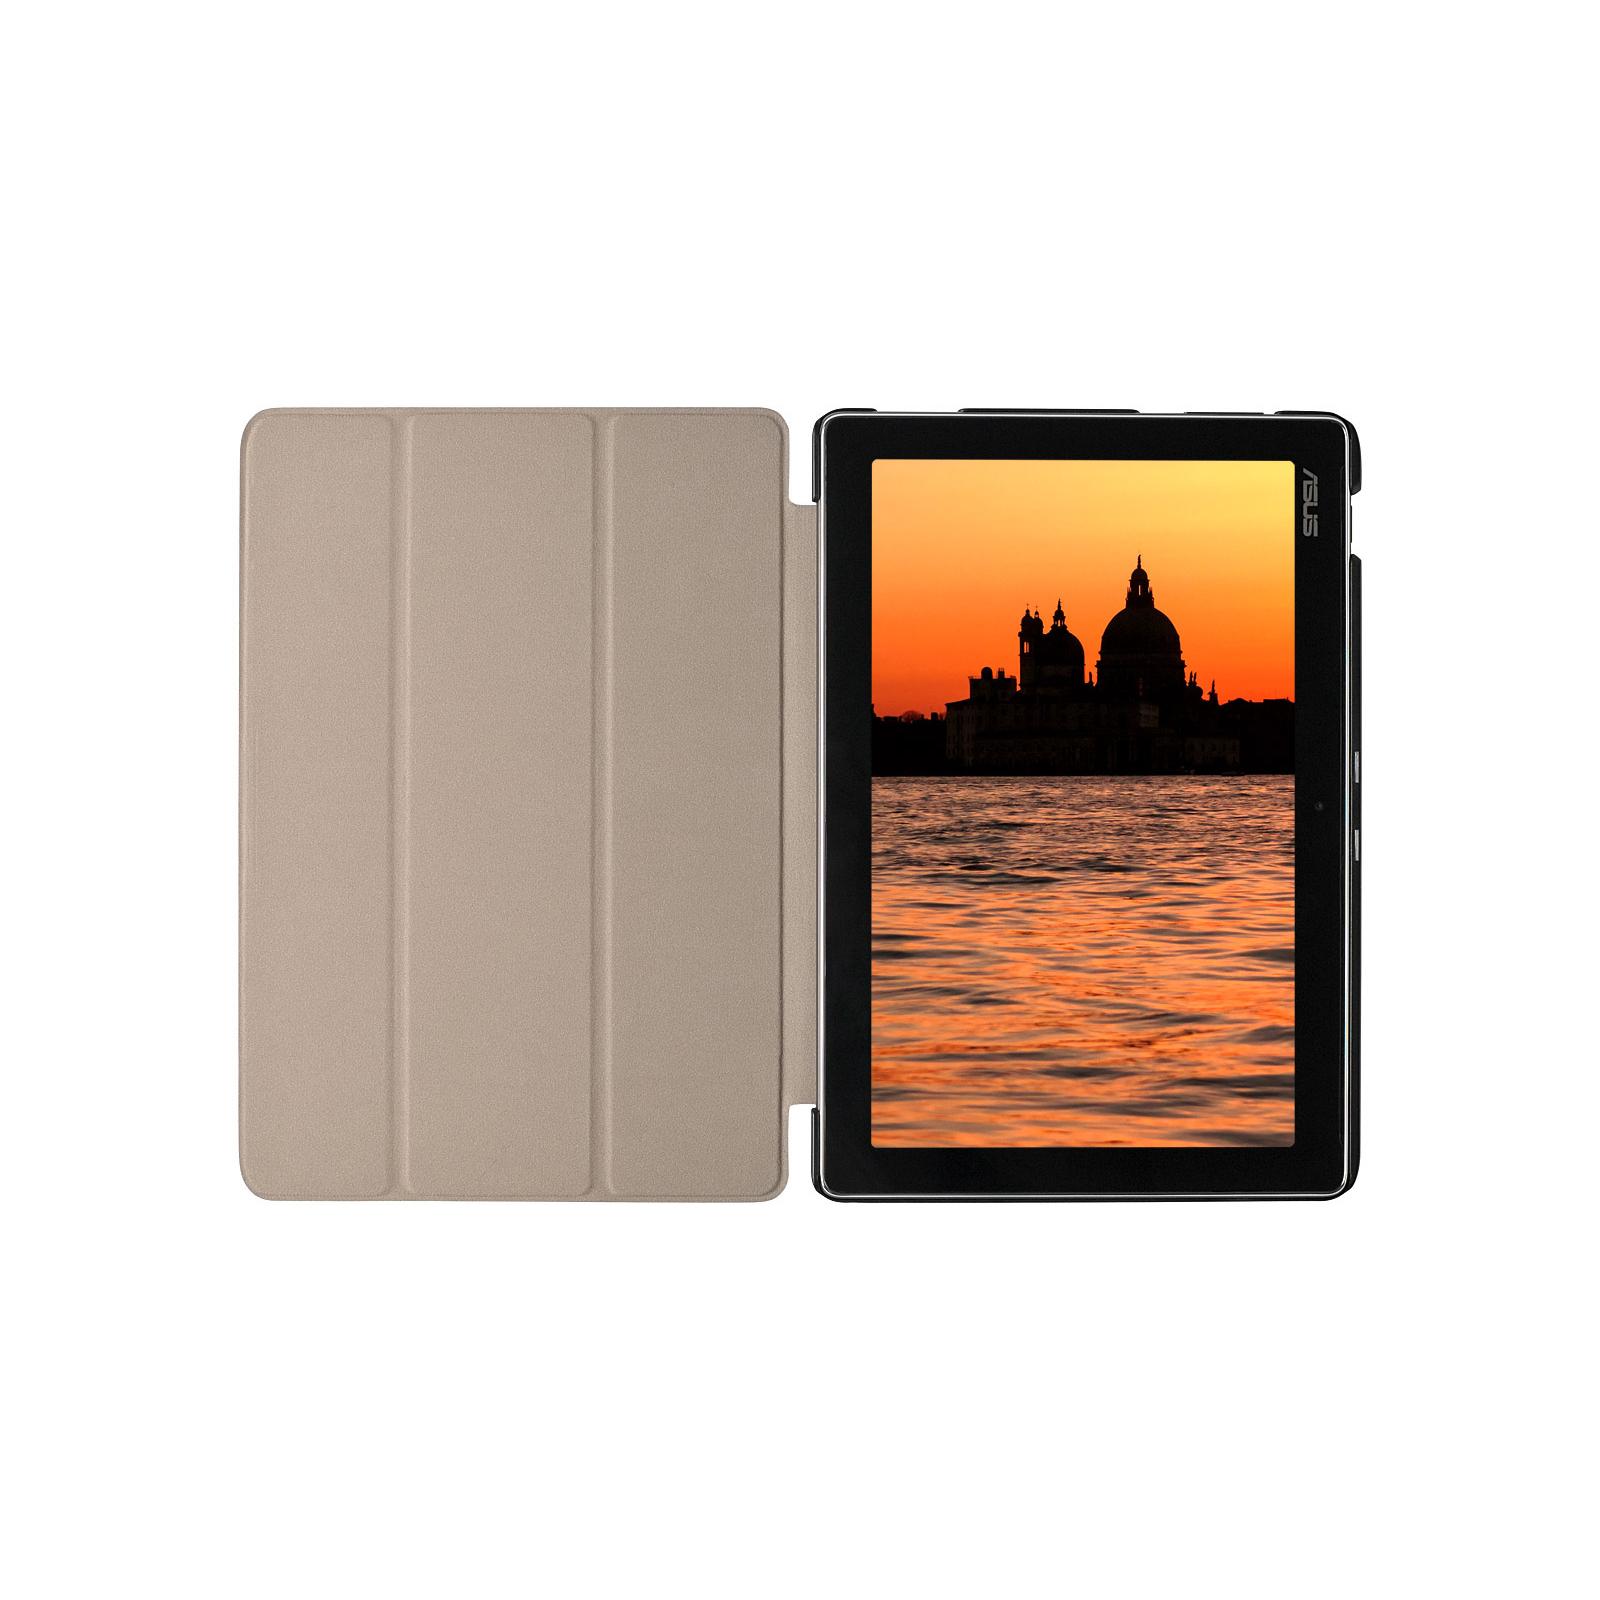 Чехол для планшета Grand-X ASUS ZenPad 10 Z300/Z300C Red (ATC - AZPZ300R) изображение 4